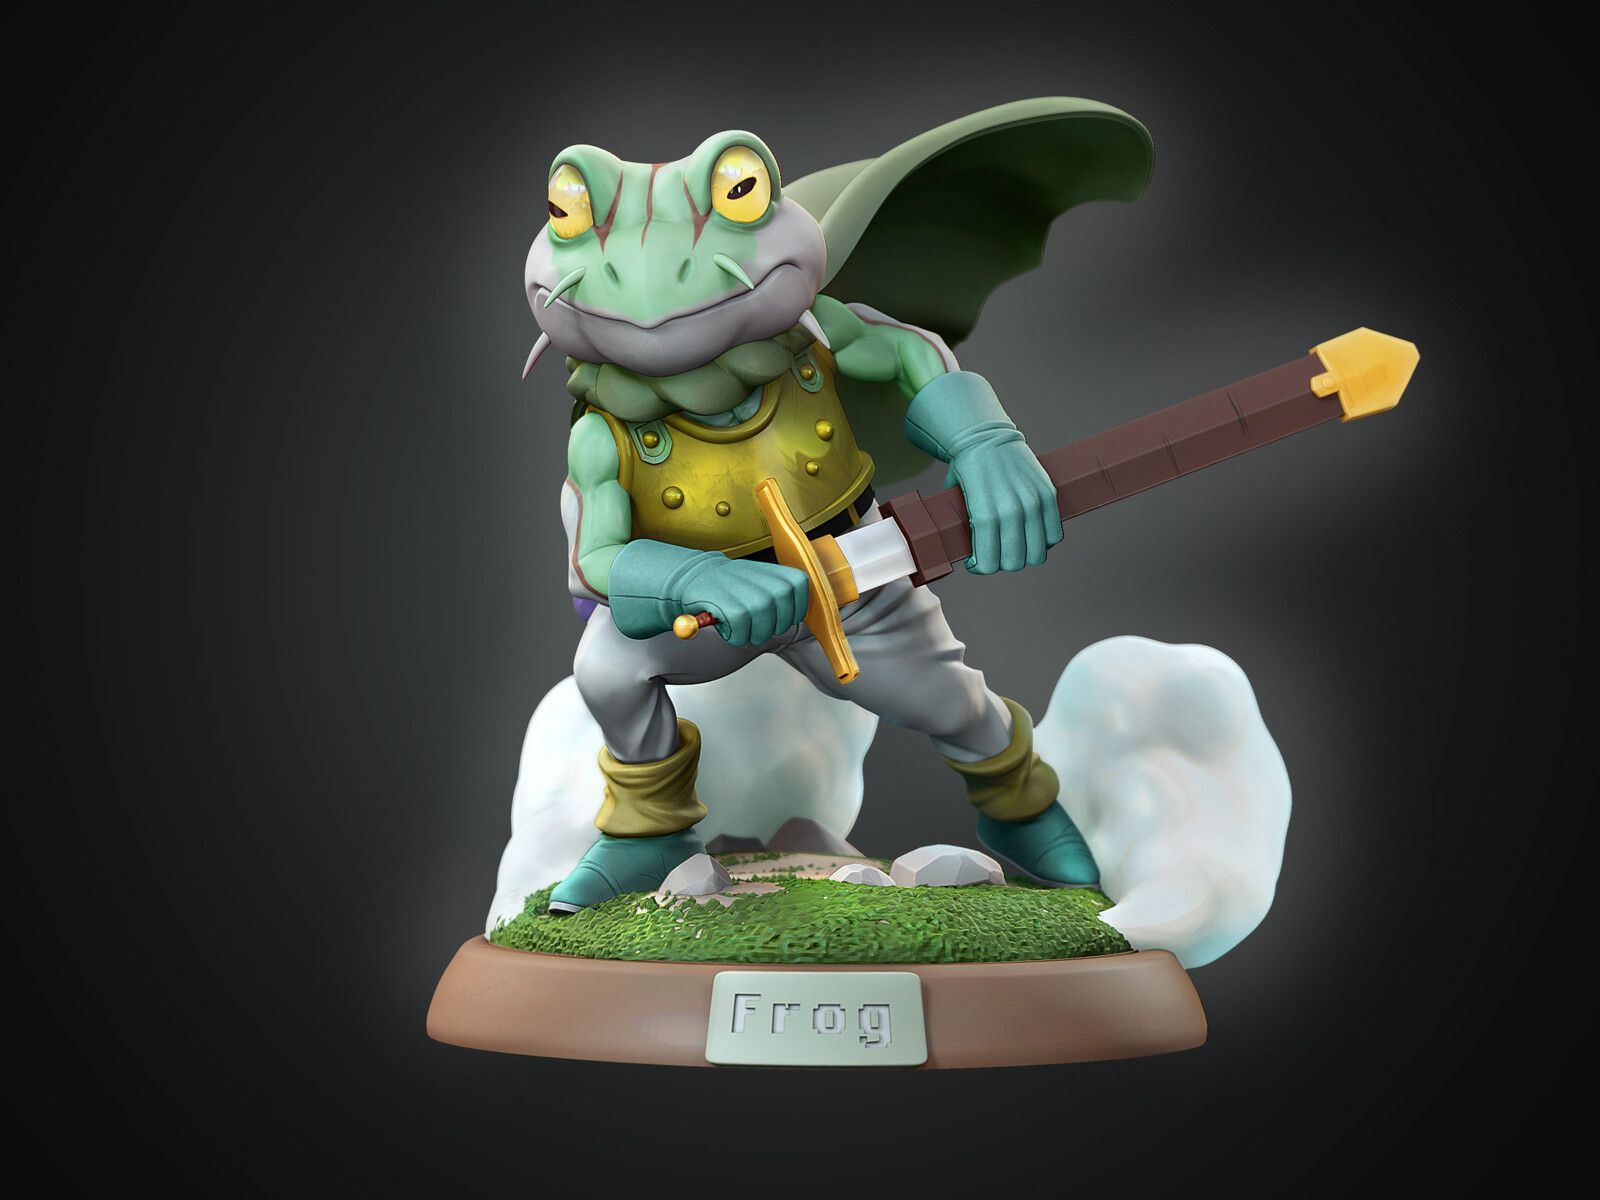 Frog Chrono Trigger Fan Art Tarcisio Rezende On Artstation At Https Www Artstation Com Artwork N5e6nd Chrono Trigger Frog Character Fan Art